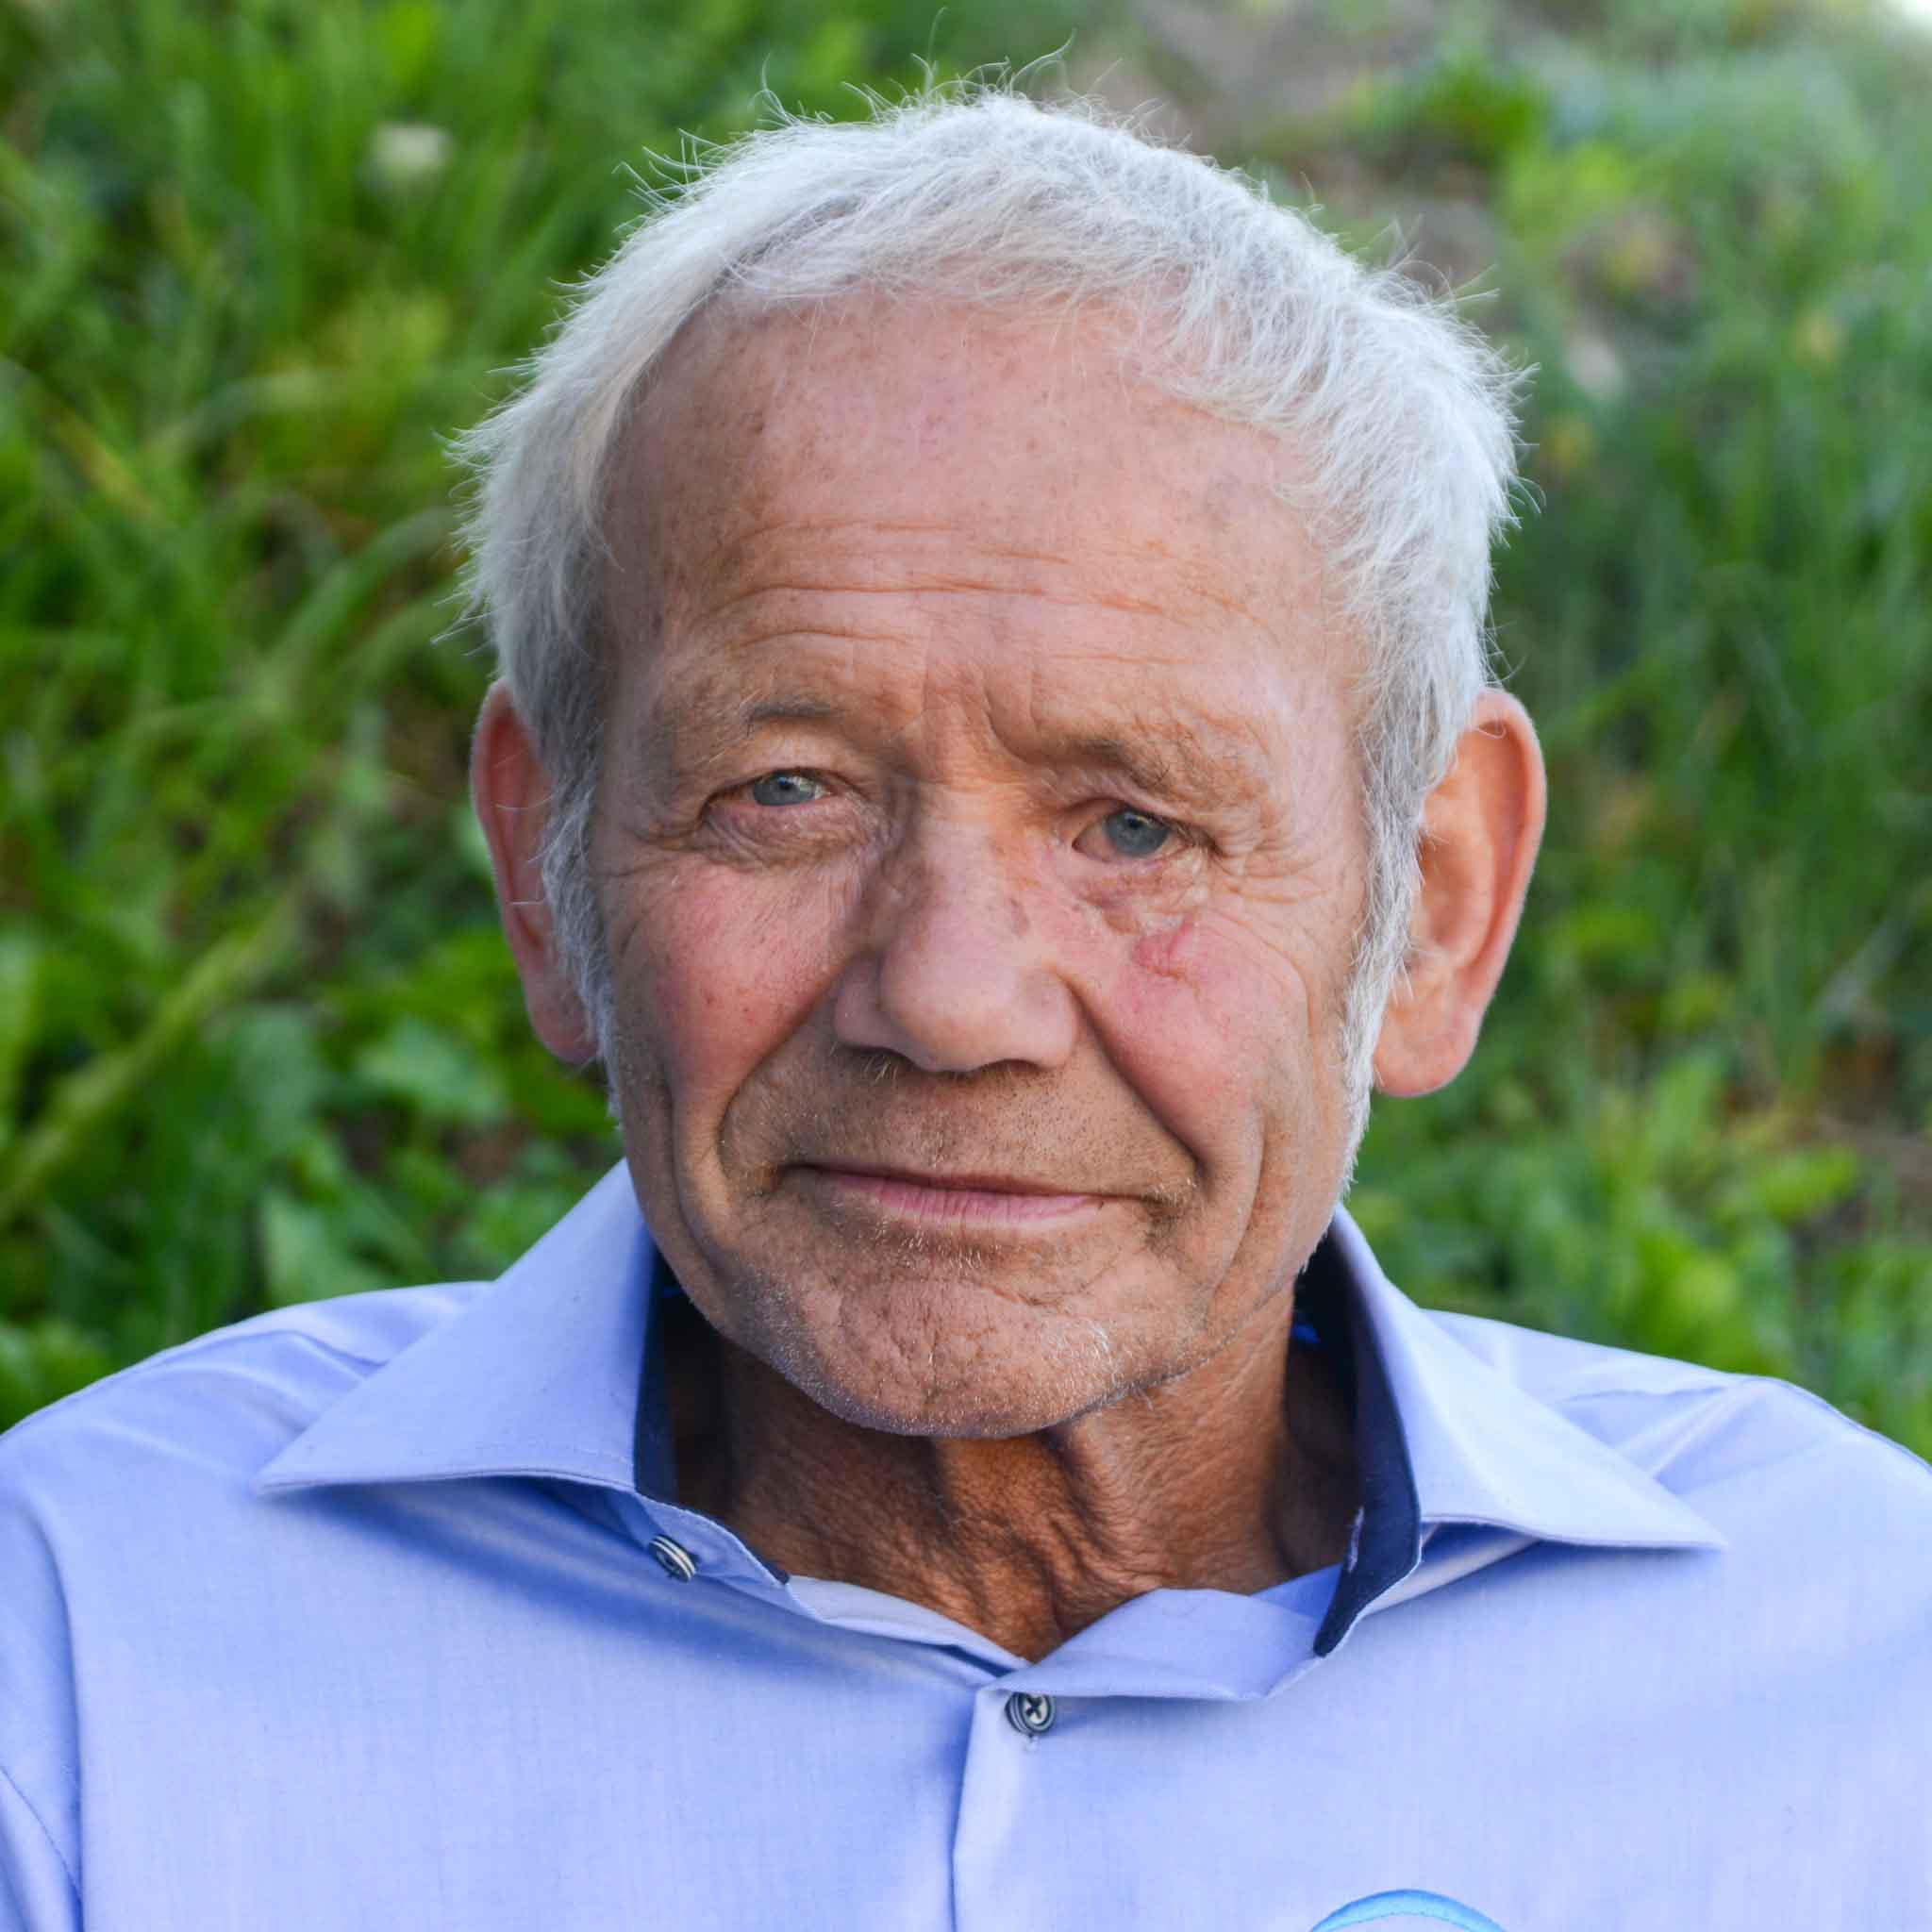 Svenning Christensen